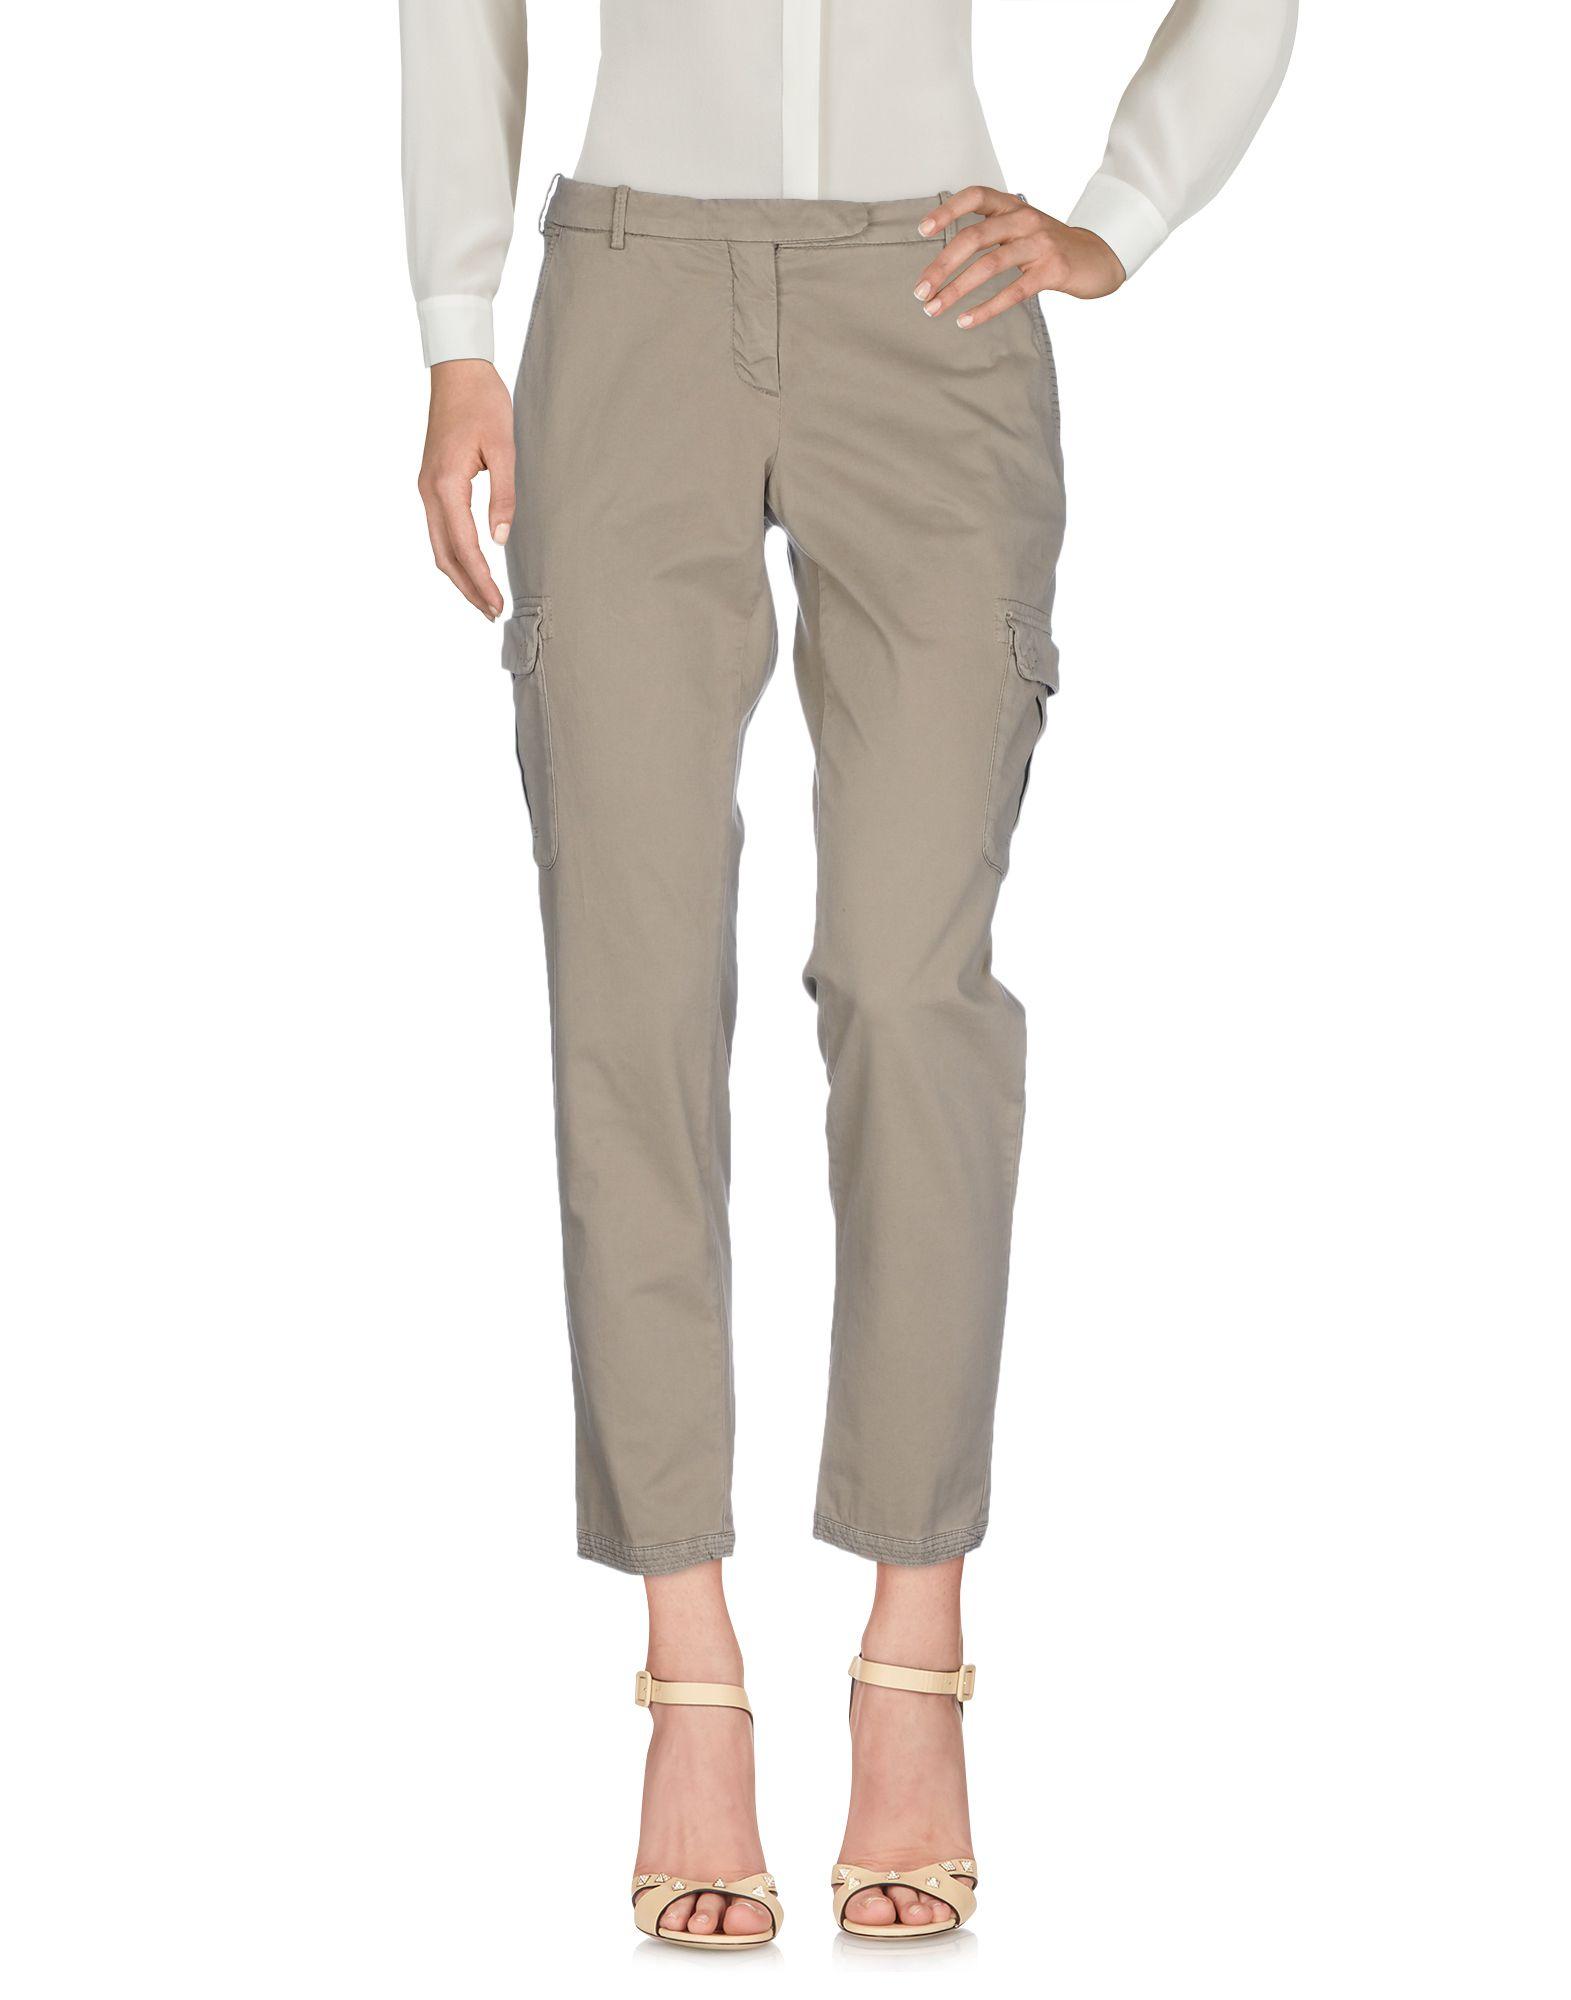 Pantalone 19.70 Nineteen Seventy damen - 13095338GS